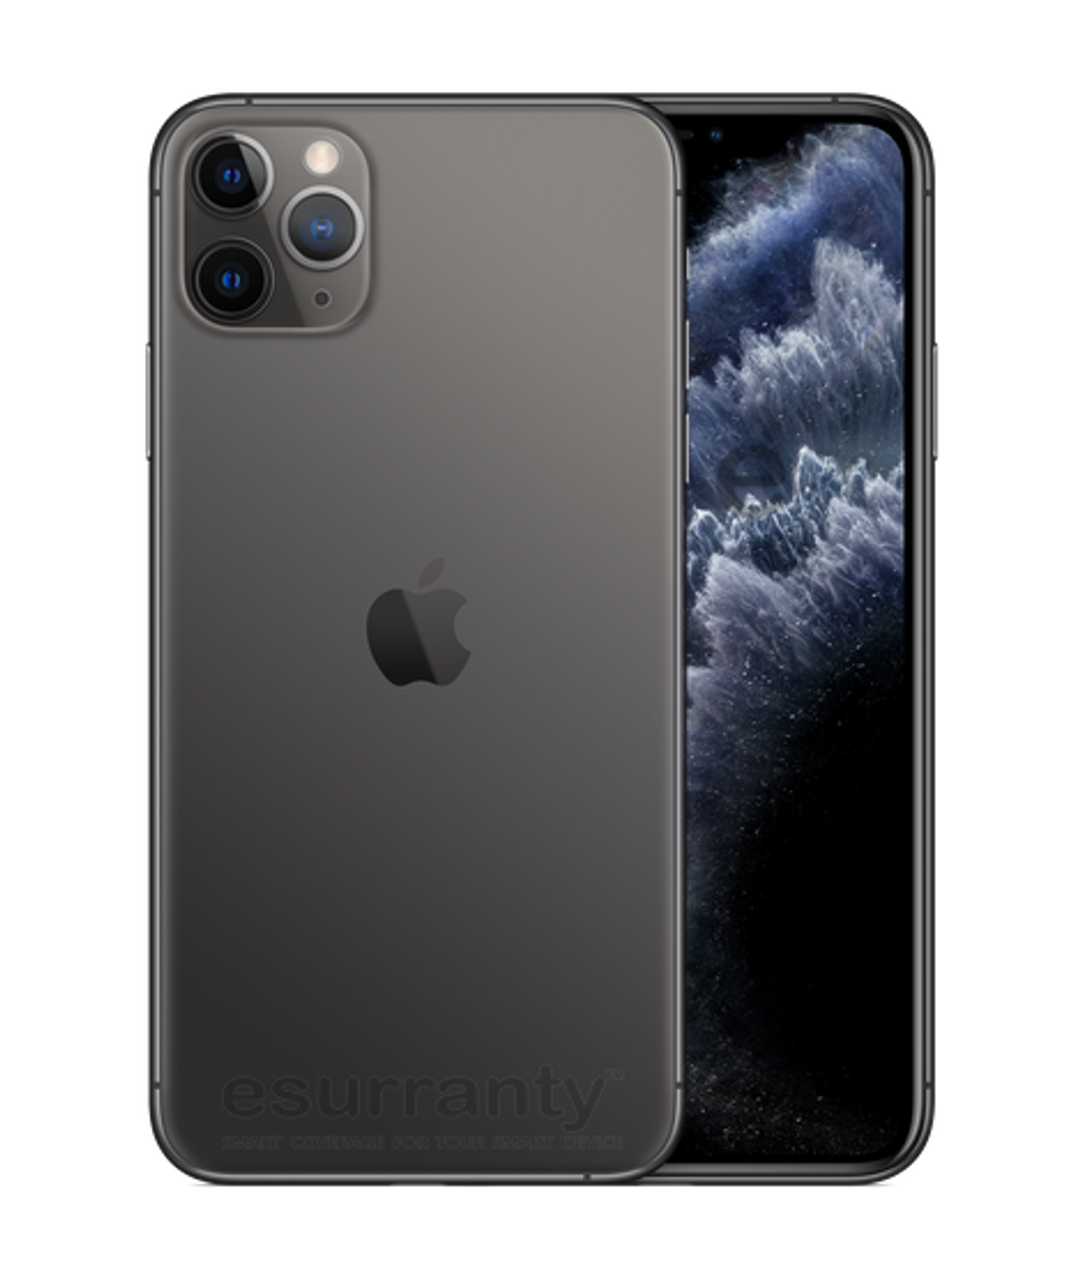 Iphone 11 Pro Max Insurance